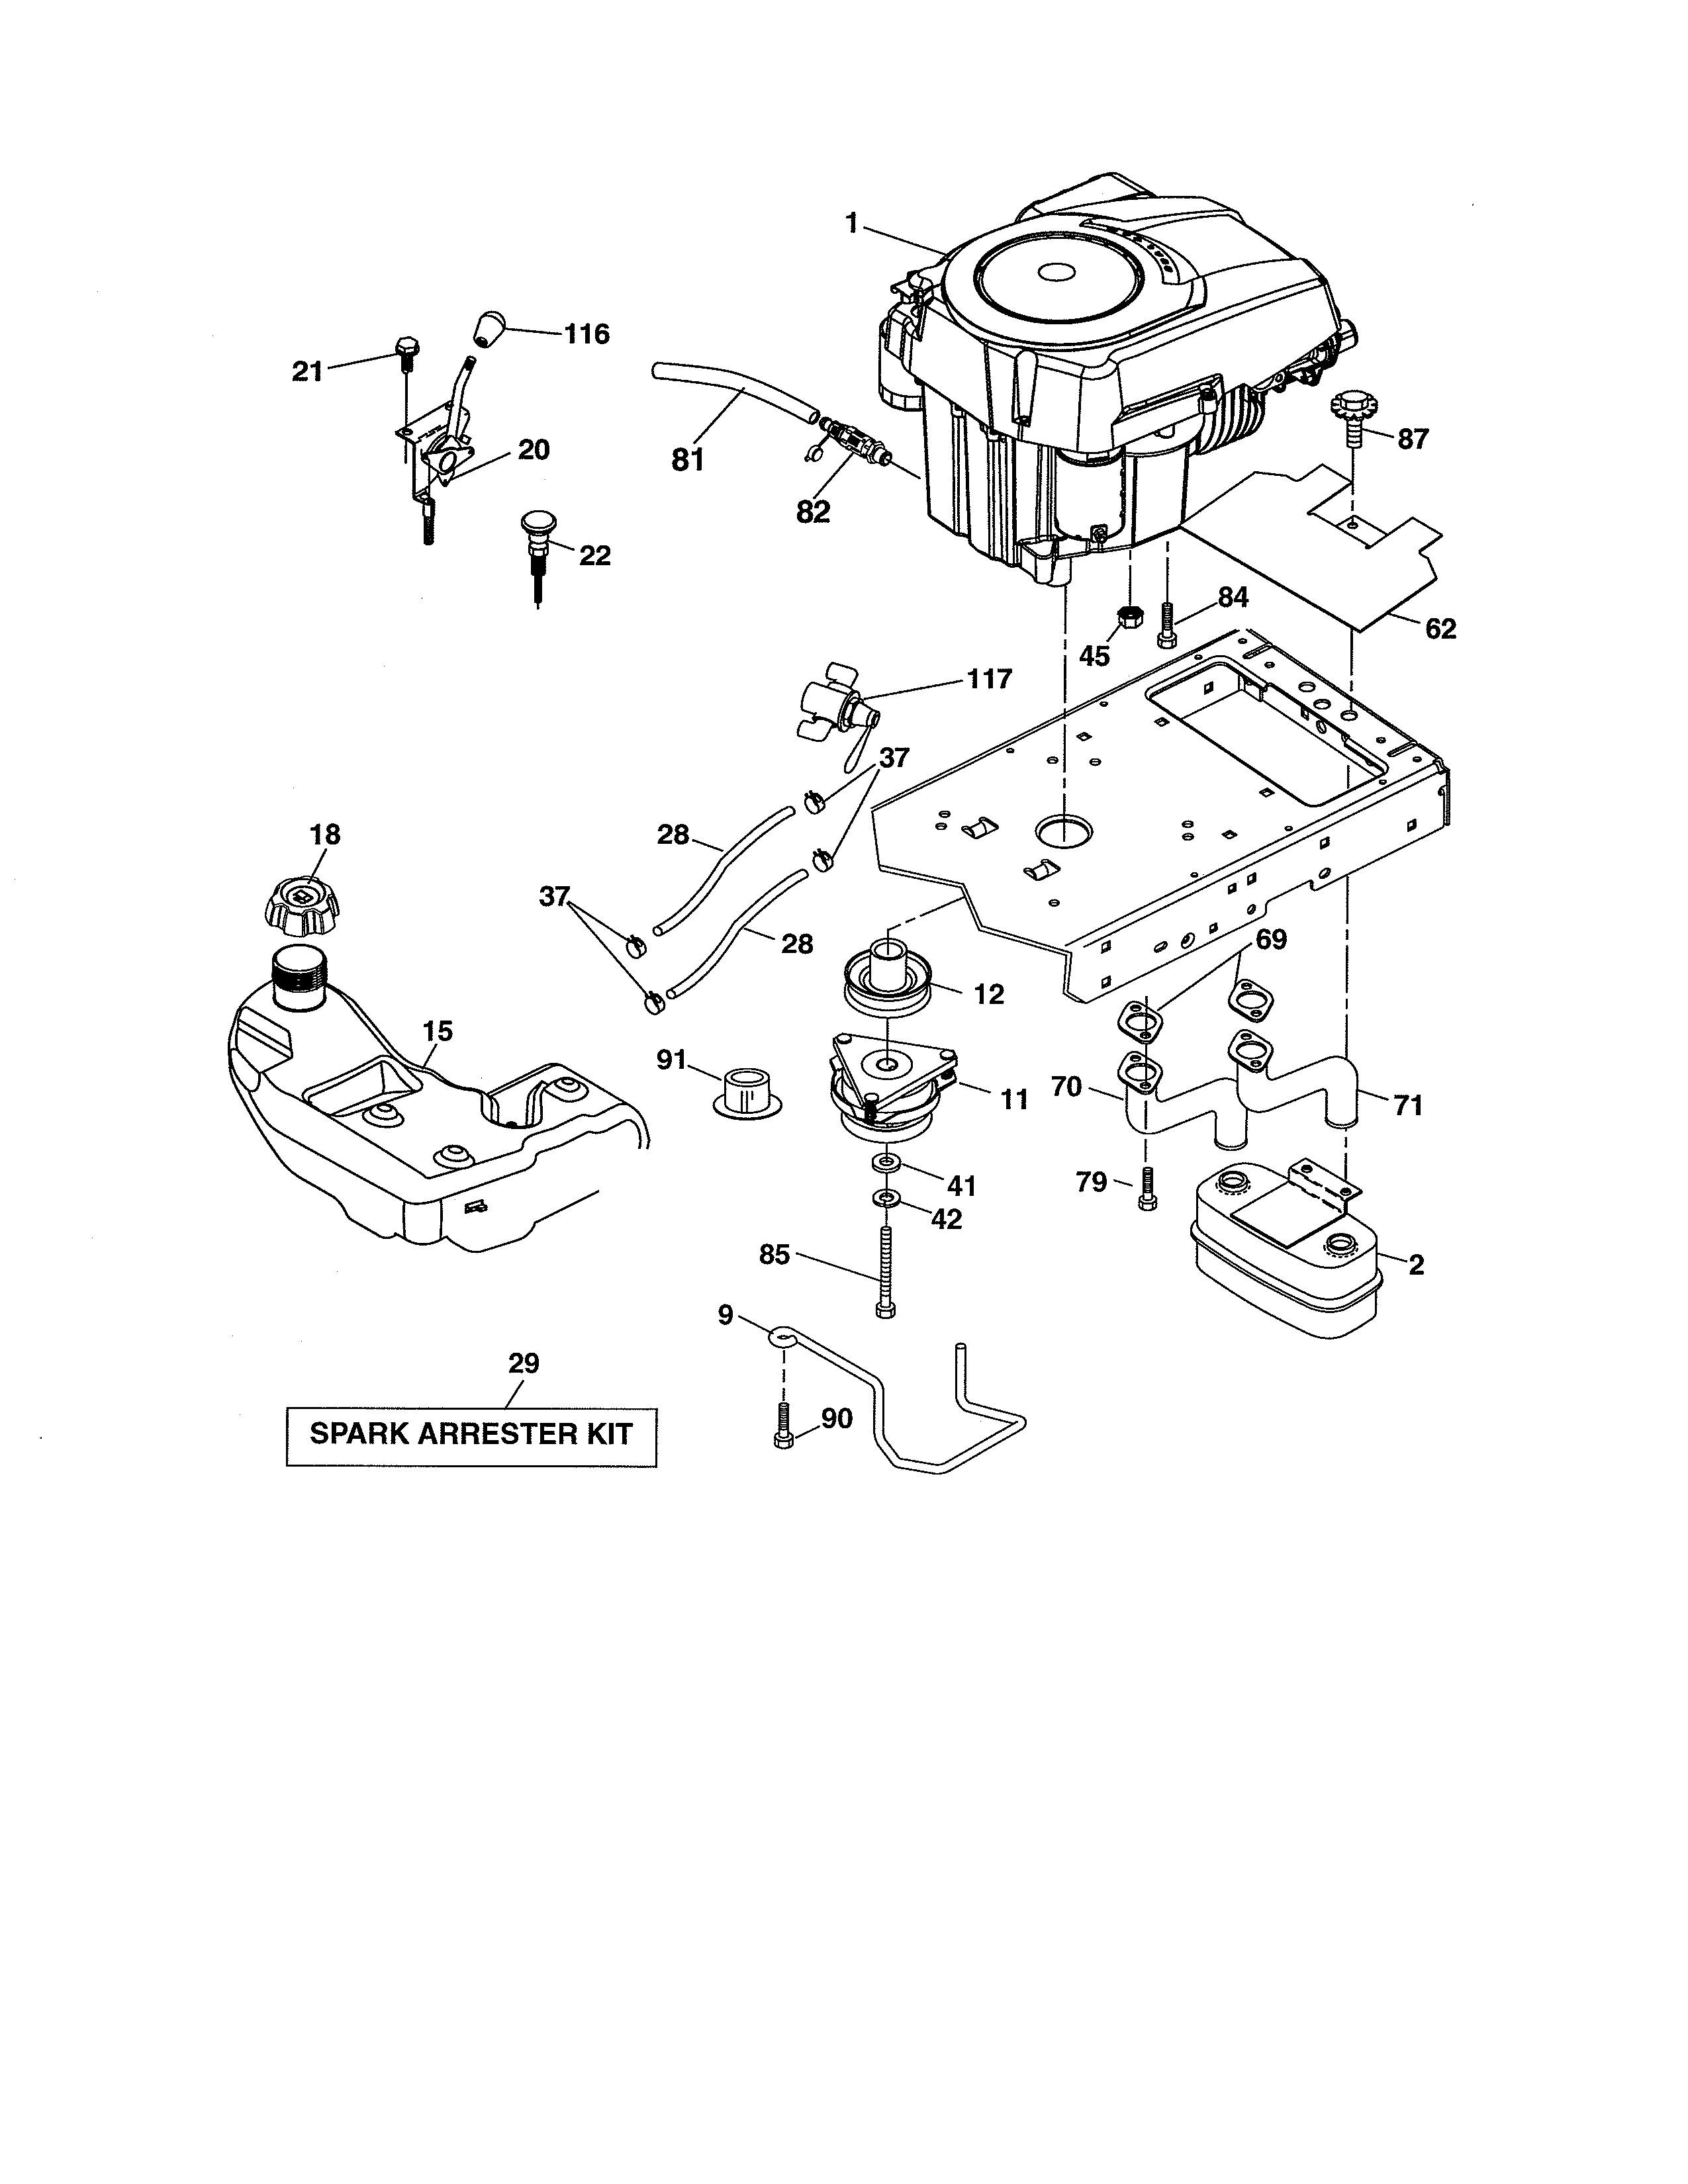 Craftsman Lawn Mower Engine Parts Diagram Craftsman Model Lawn Tractor Genuine Parts Of Craftsman Lawn Mower Engine Parts Diagram